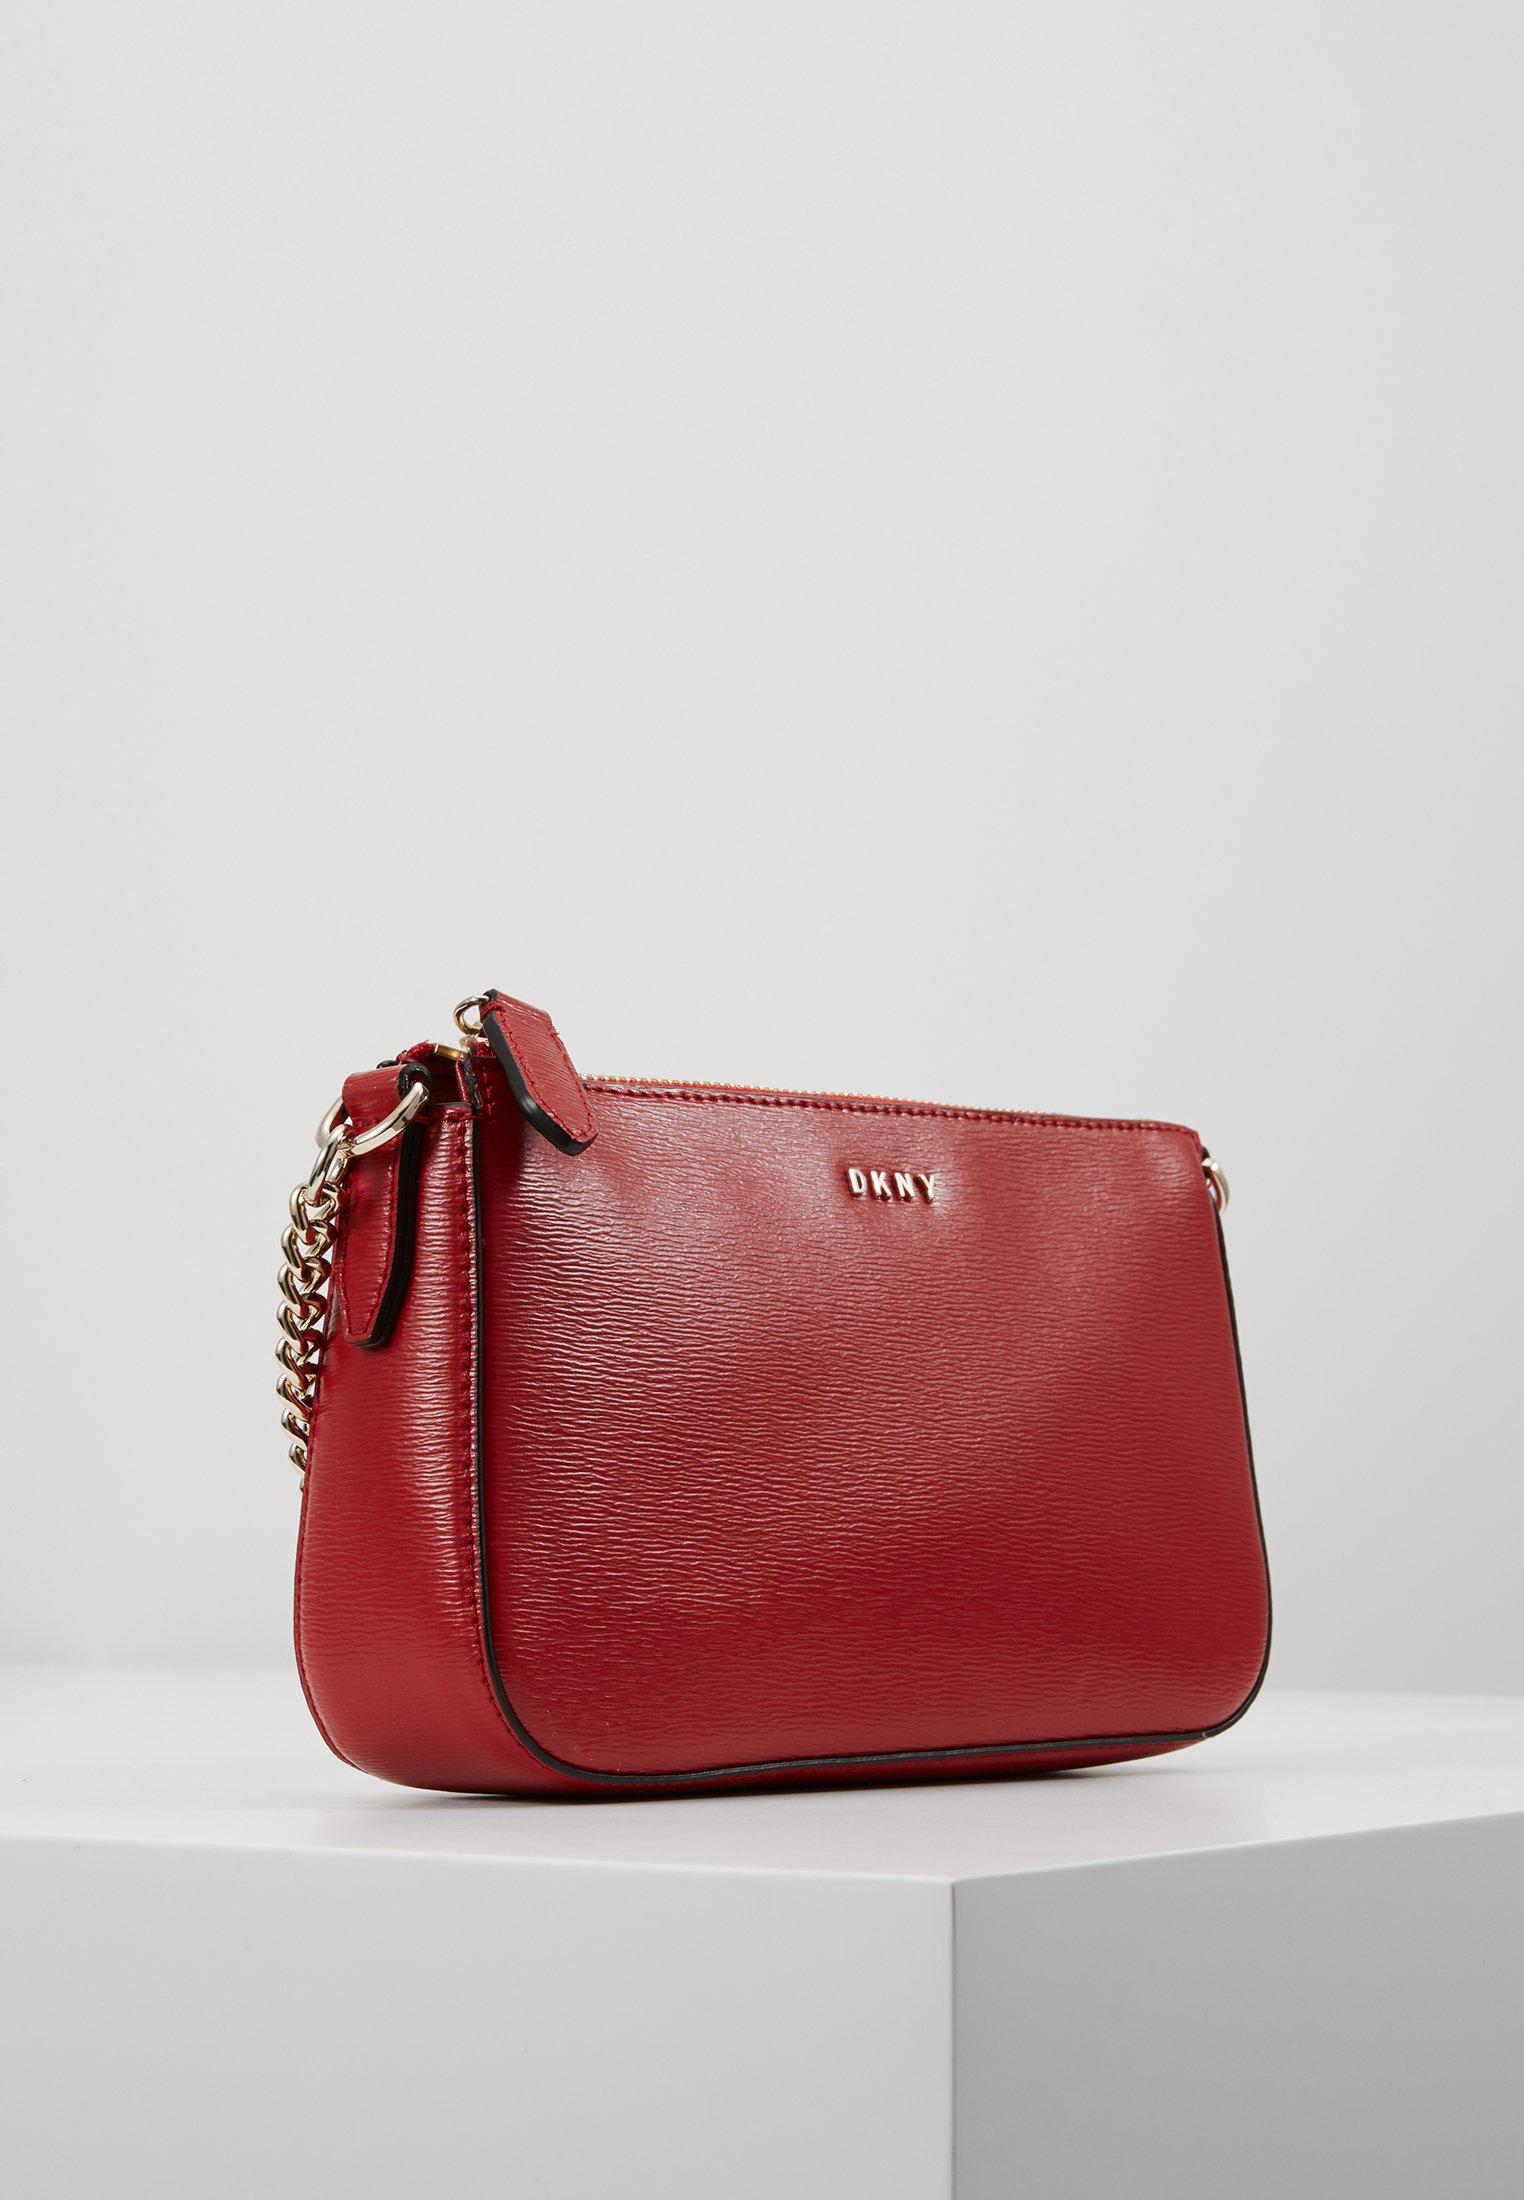 Dkny Sutton Demi Xbody - Handtasche Bright Red/rot